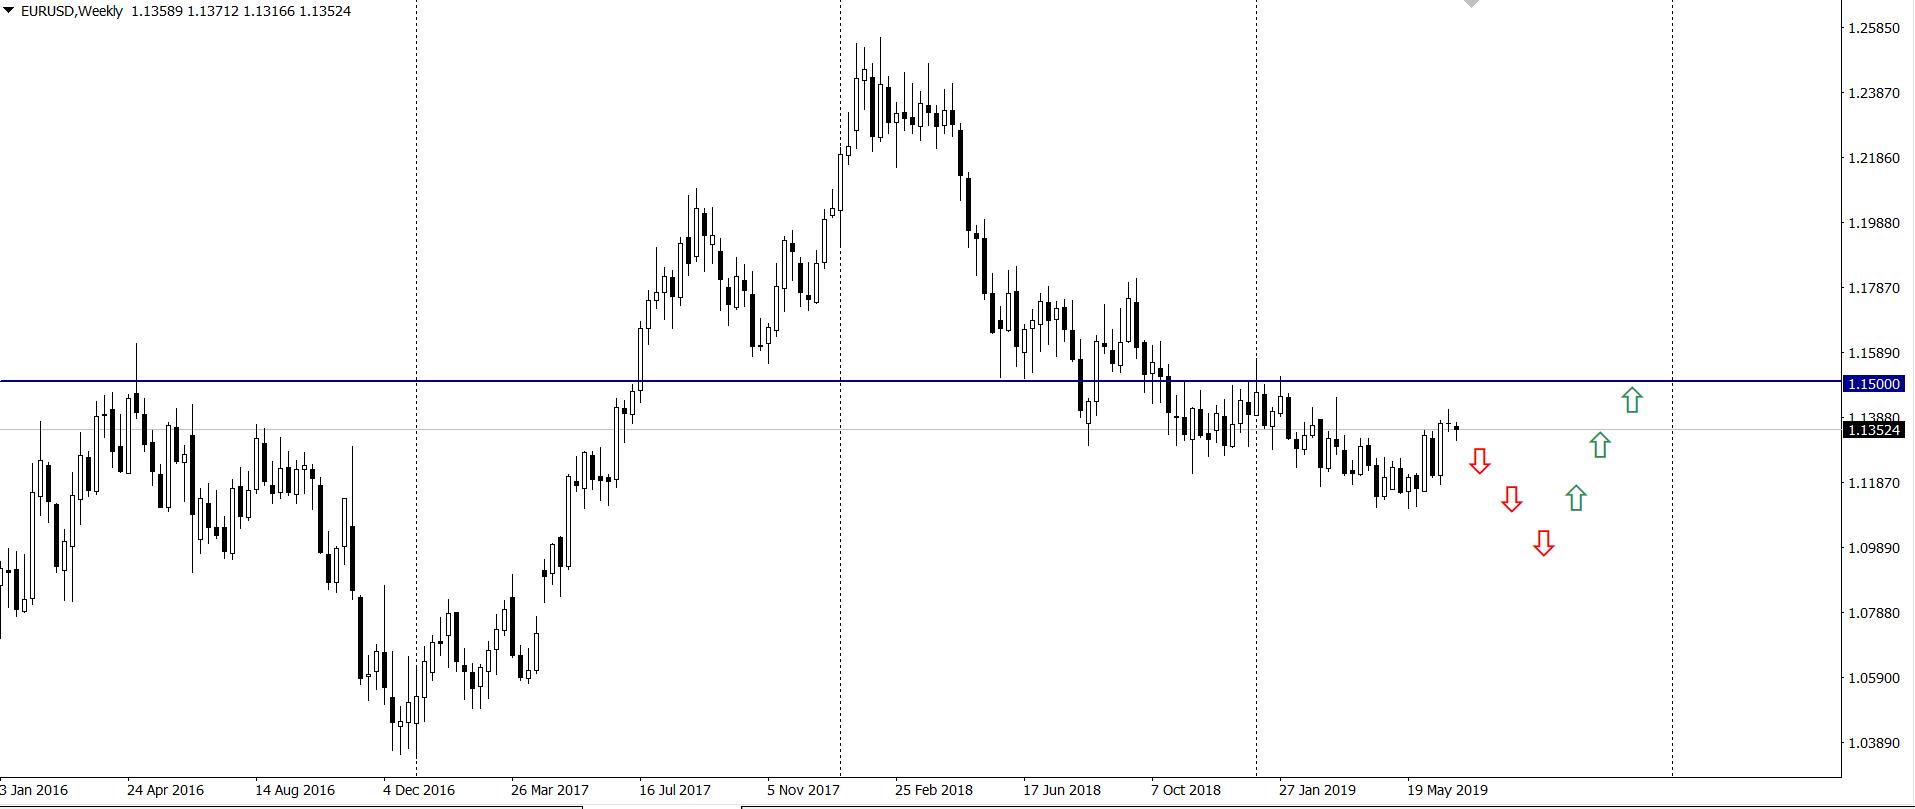 prognoza kursu euro do dolara wg. analityków Rabobanku